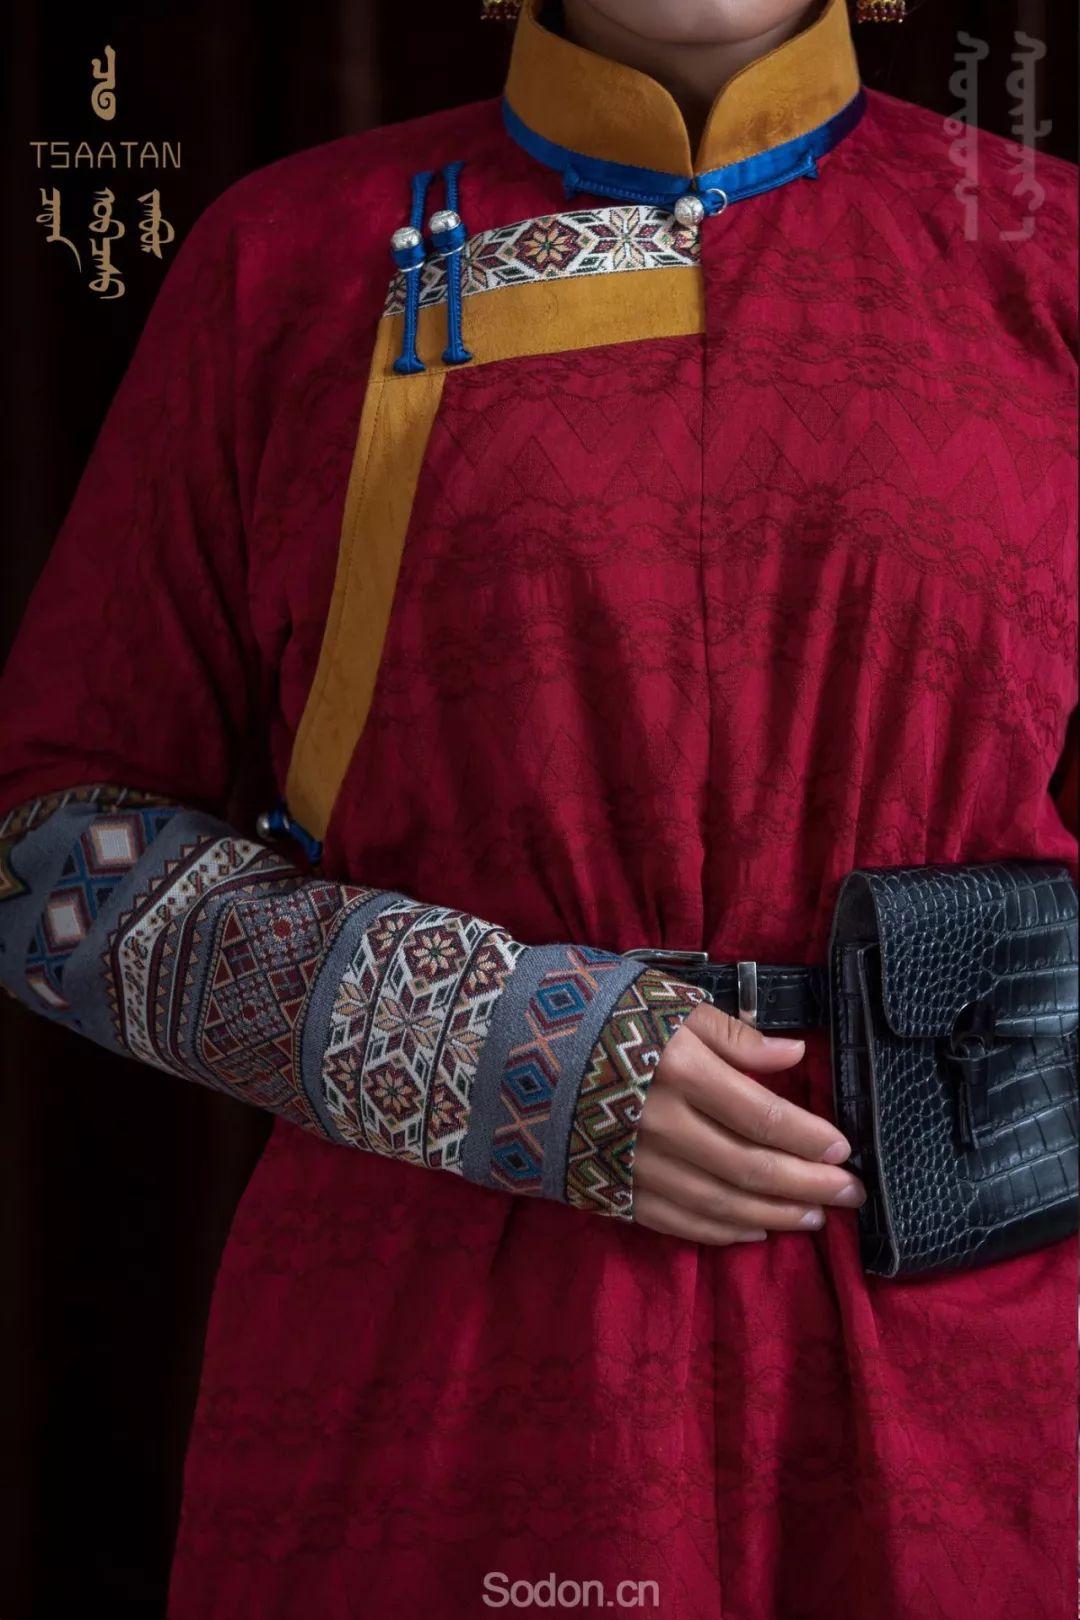 TSAATAN蒙古时装 2019夏季新款首发 第55张